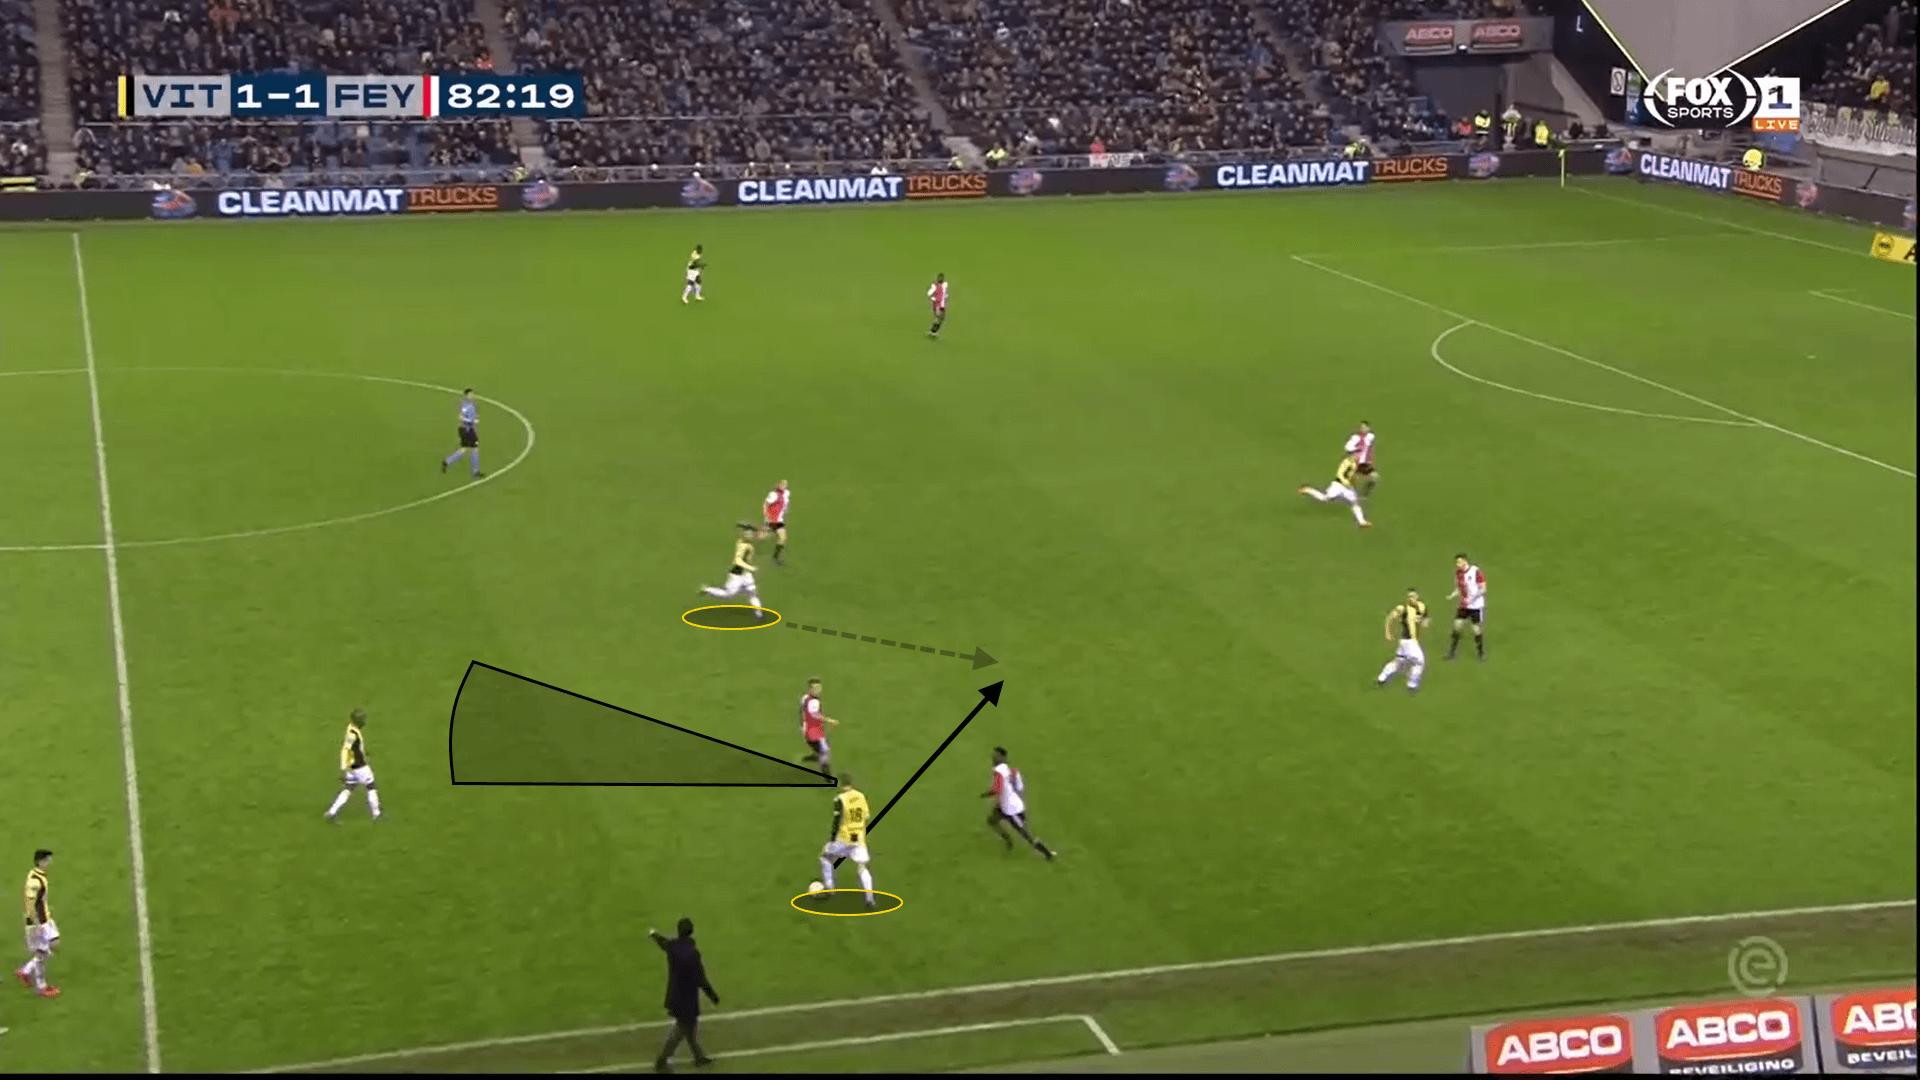 Martin Ødegaard Vitesse Eredivisie Tactical Analysis Statistics